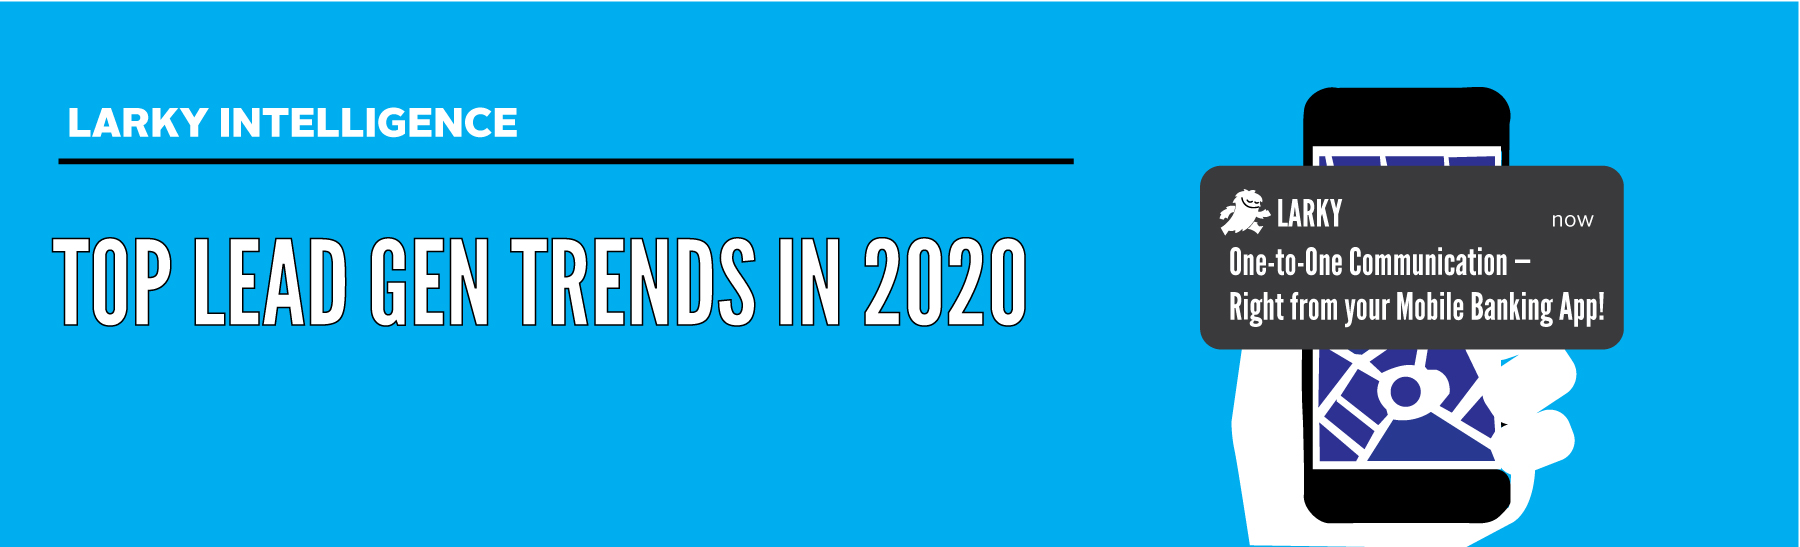 Top Lead Generation Trends in 2020